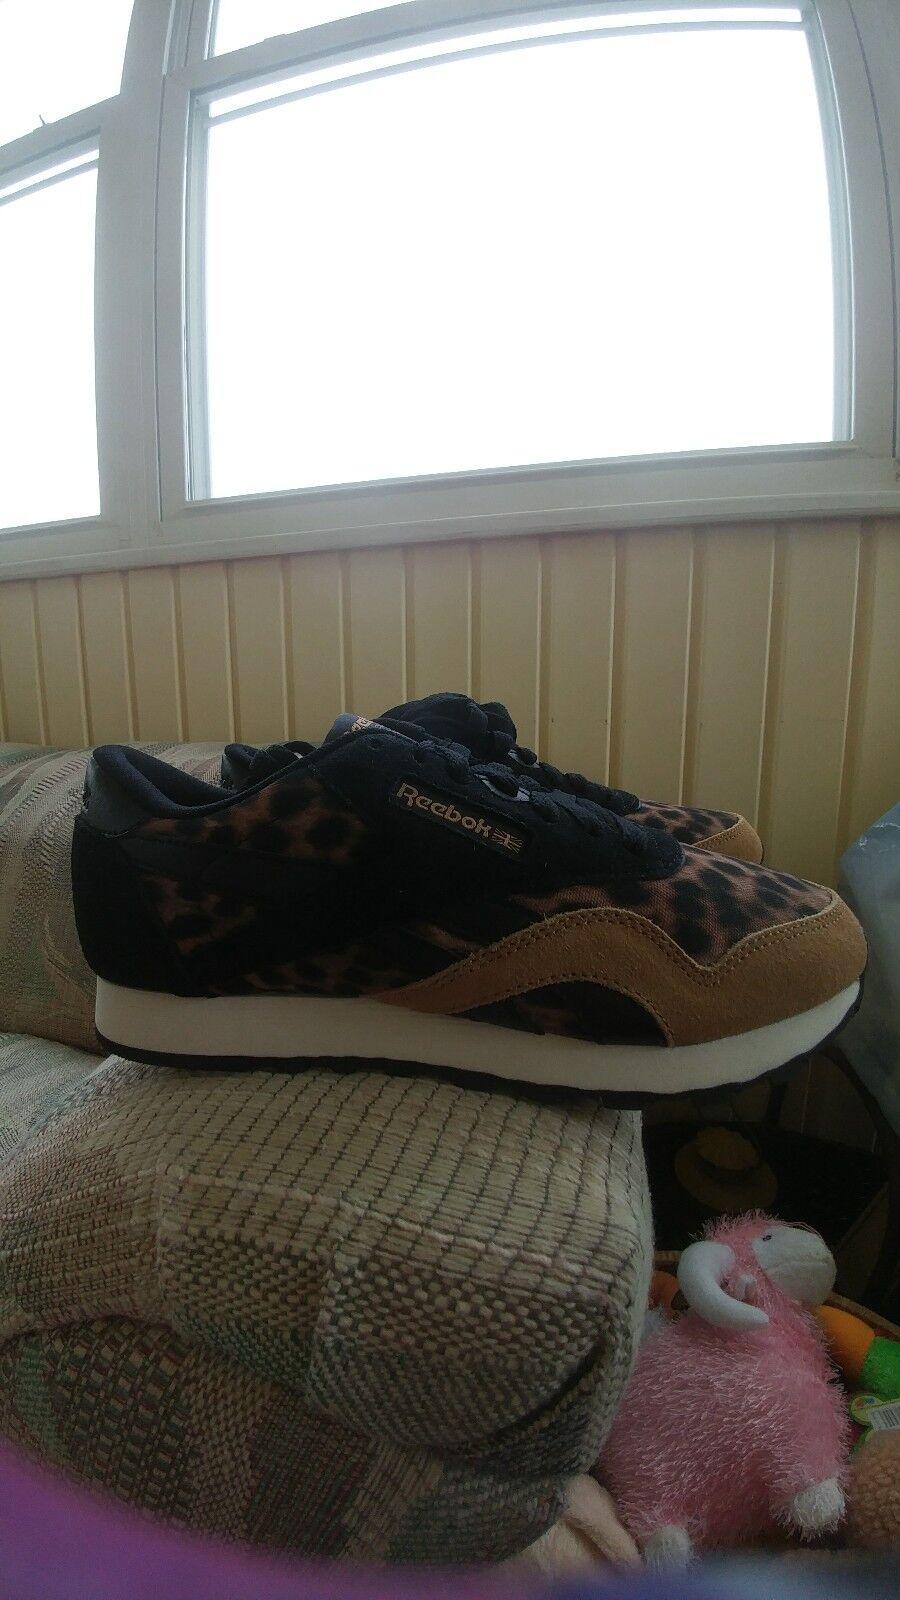 Reebok Classic Nylon Women's shoes Size 7